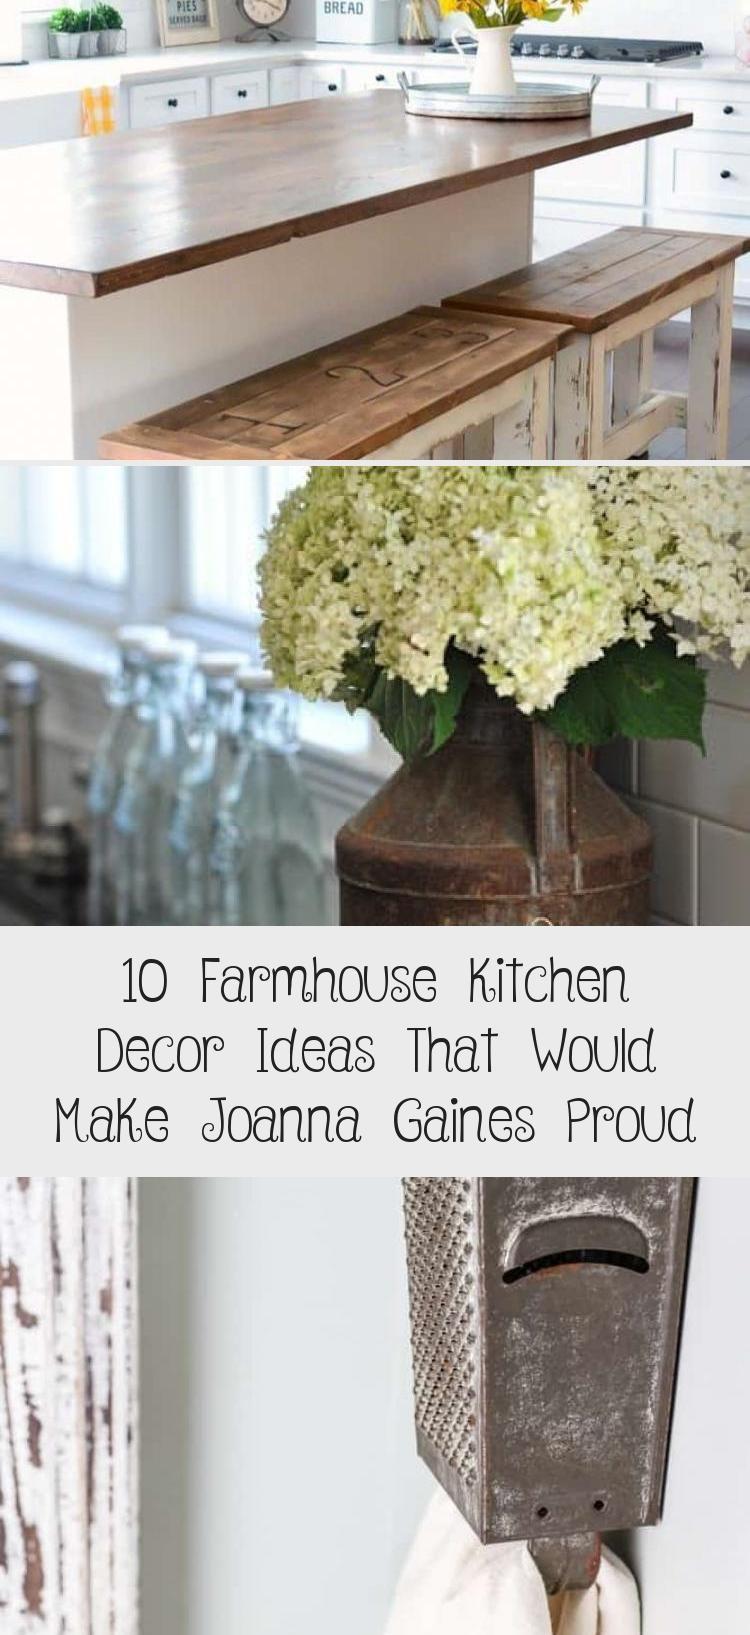 10 ideas for farm kitchen decor that would make Joanna Gaines proud  Kitchen Decorations 10 ideas for farm kitchen decor that would make Joanna Gaines proud  Kitchen Deco...